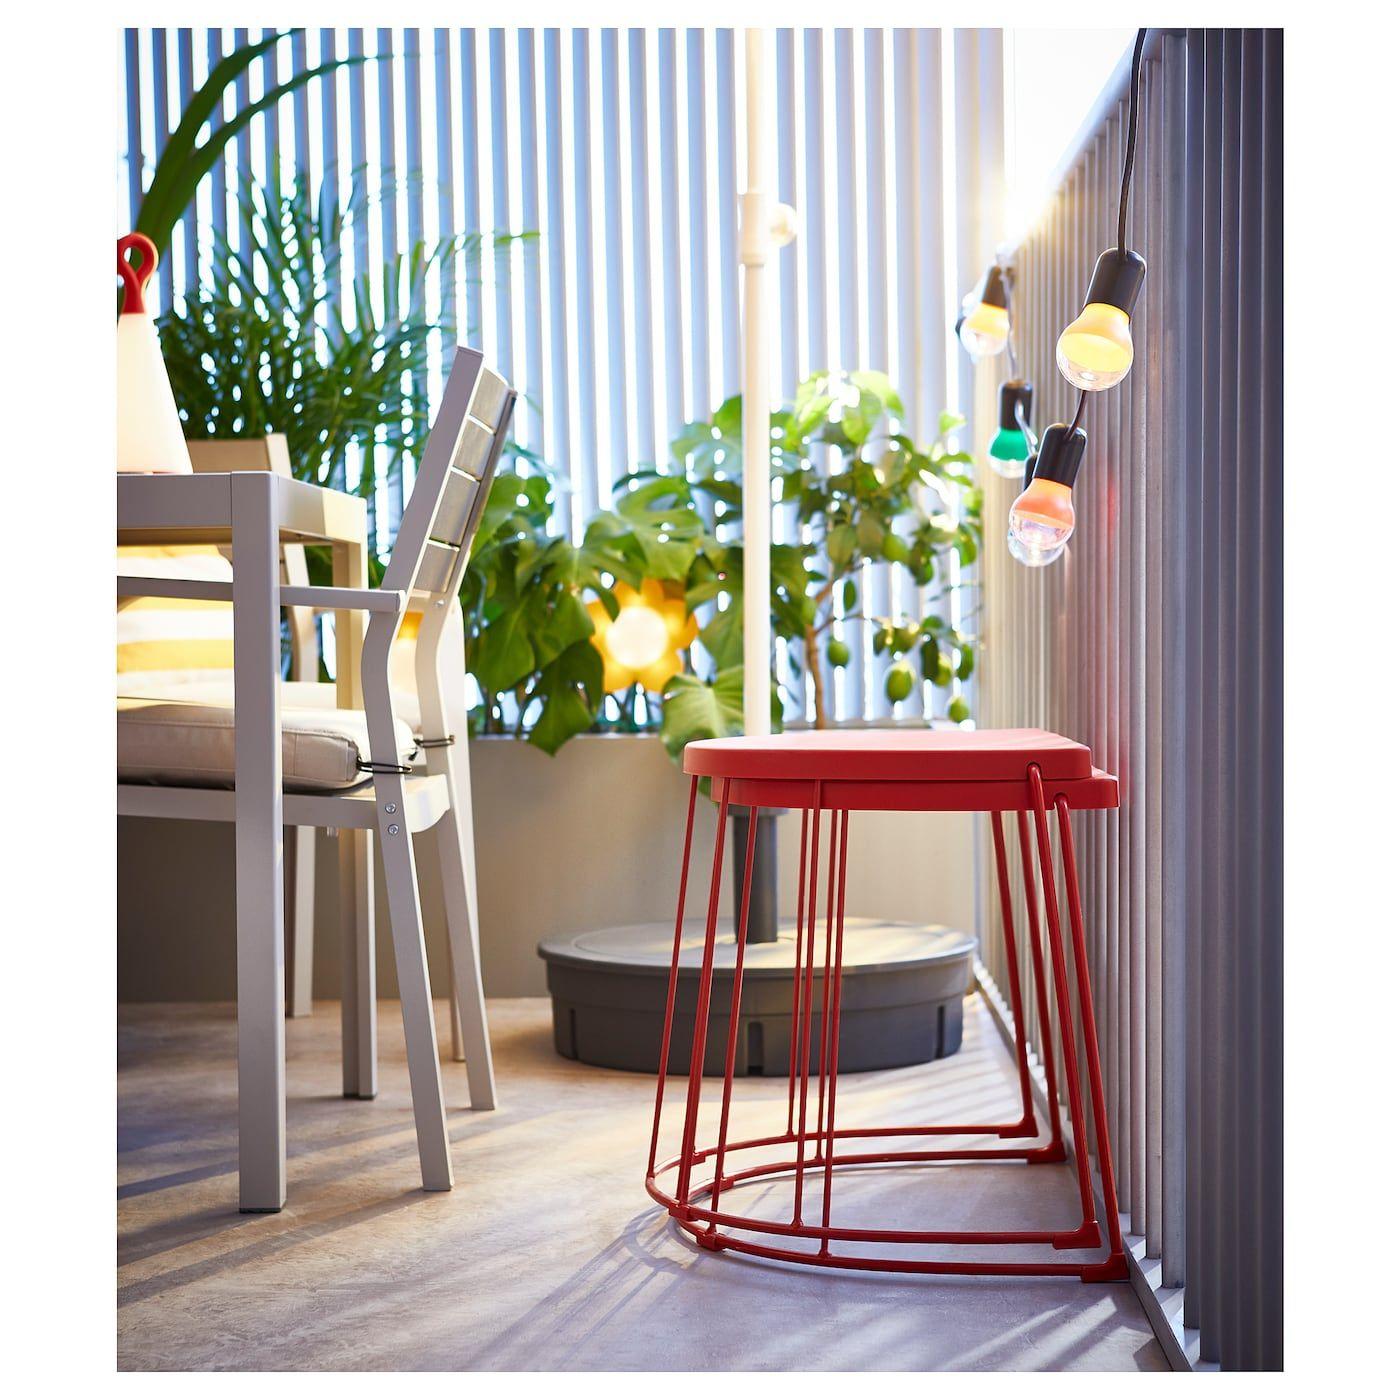 IKEA US Furniture and Home Furnishings in 2020 | Ikea